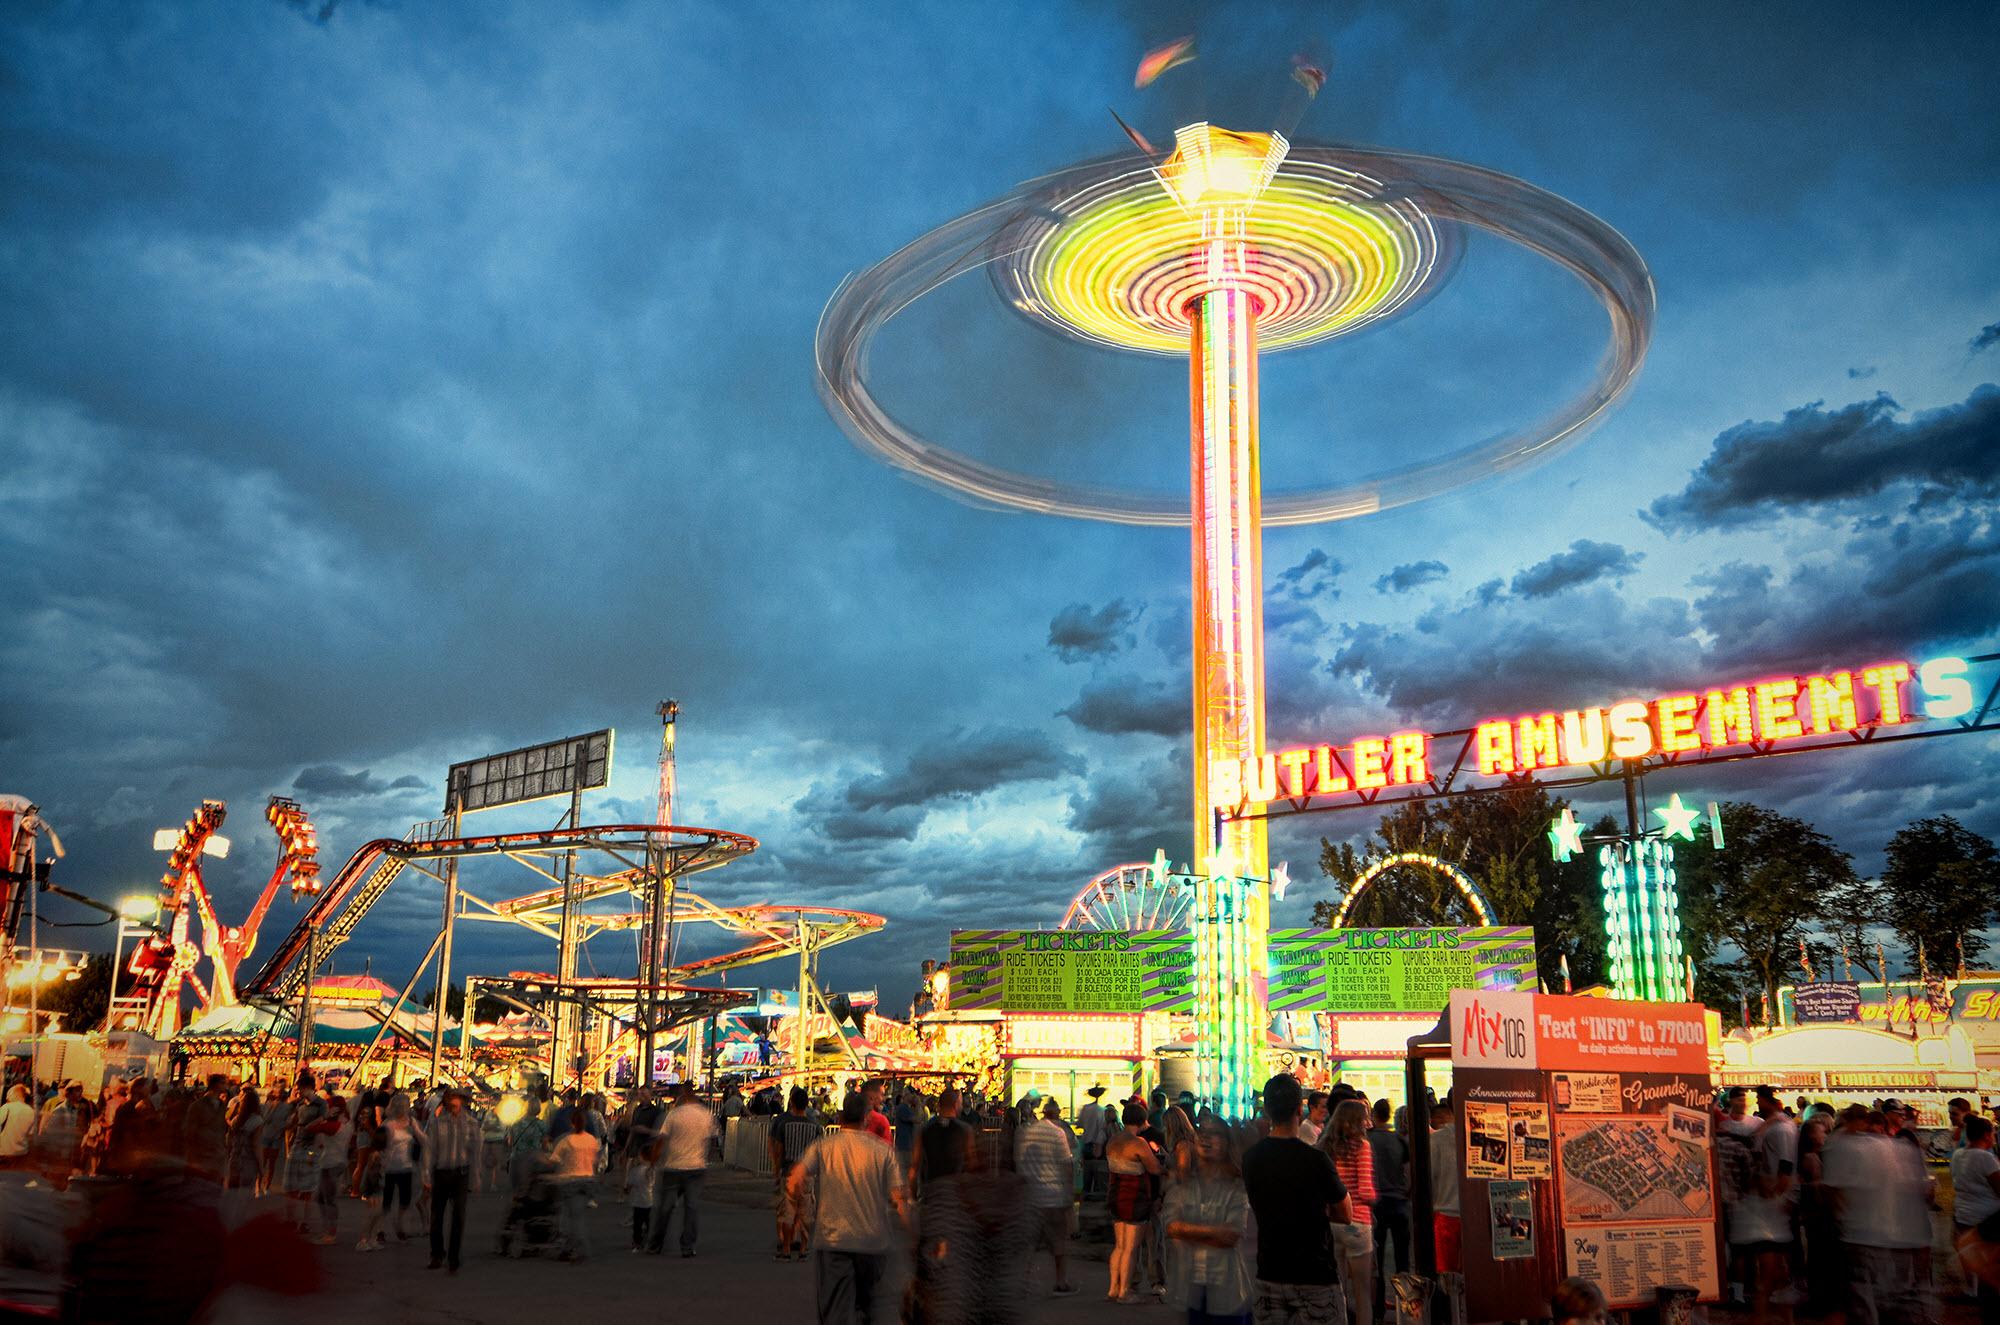 carnival scene including a ferris wheel